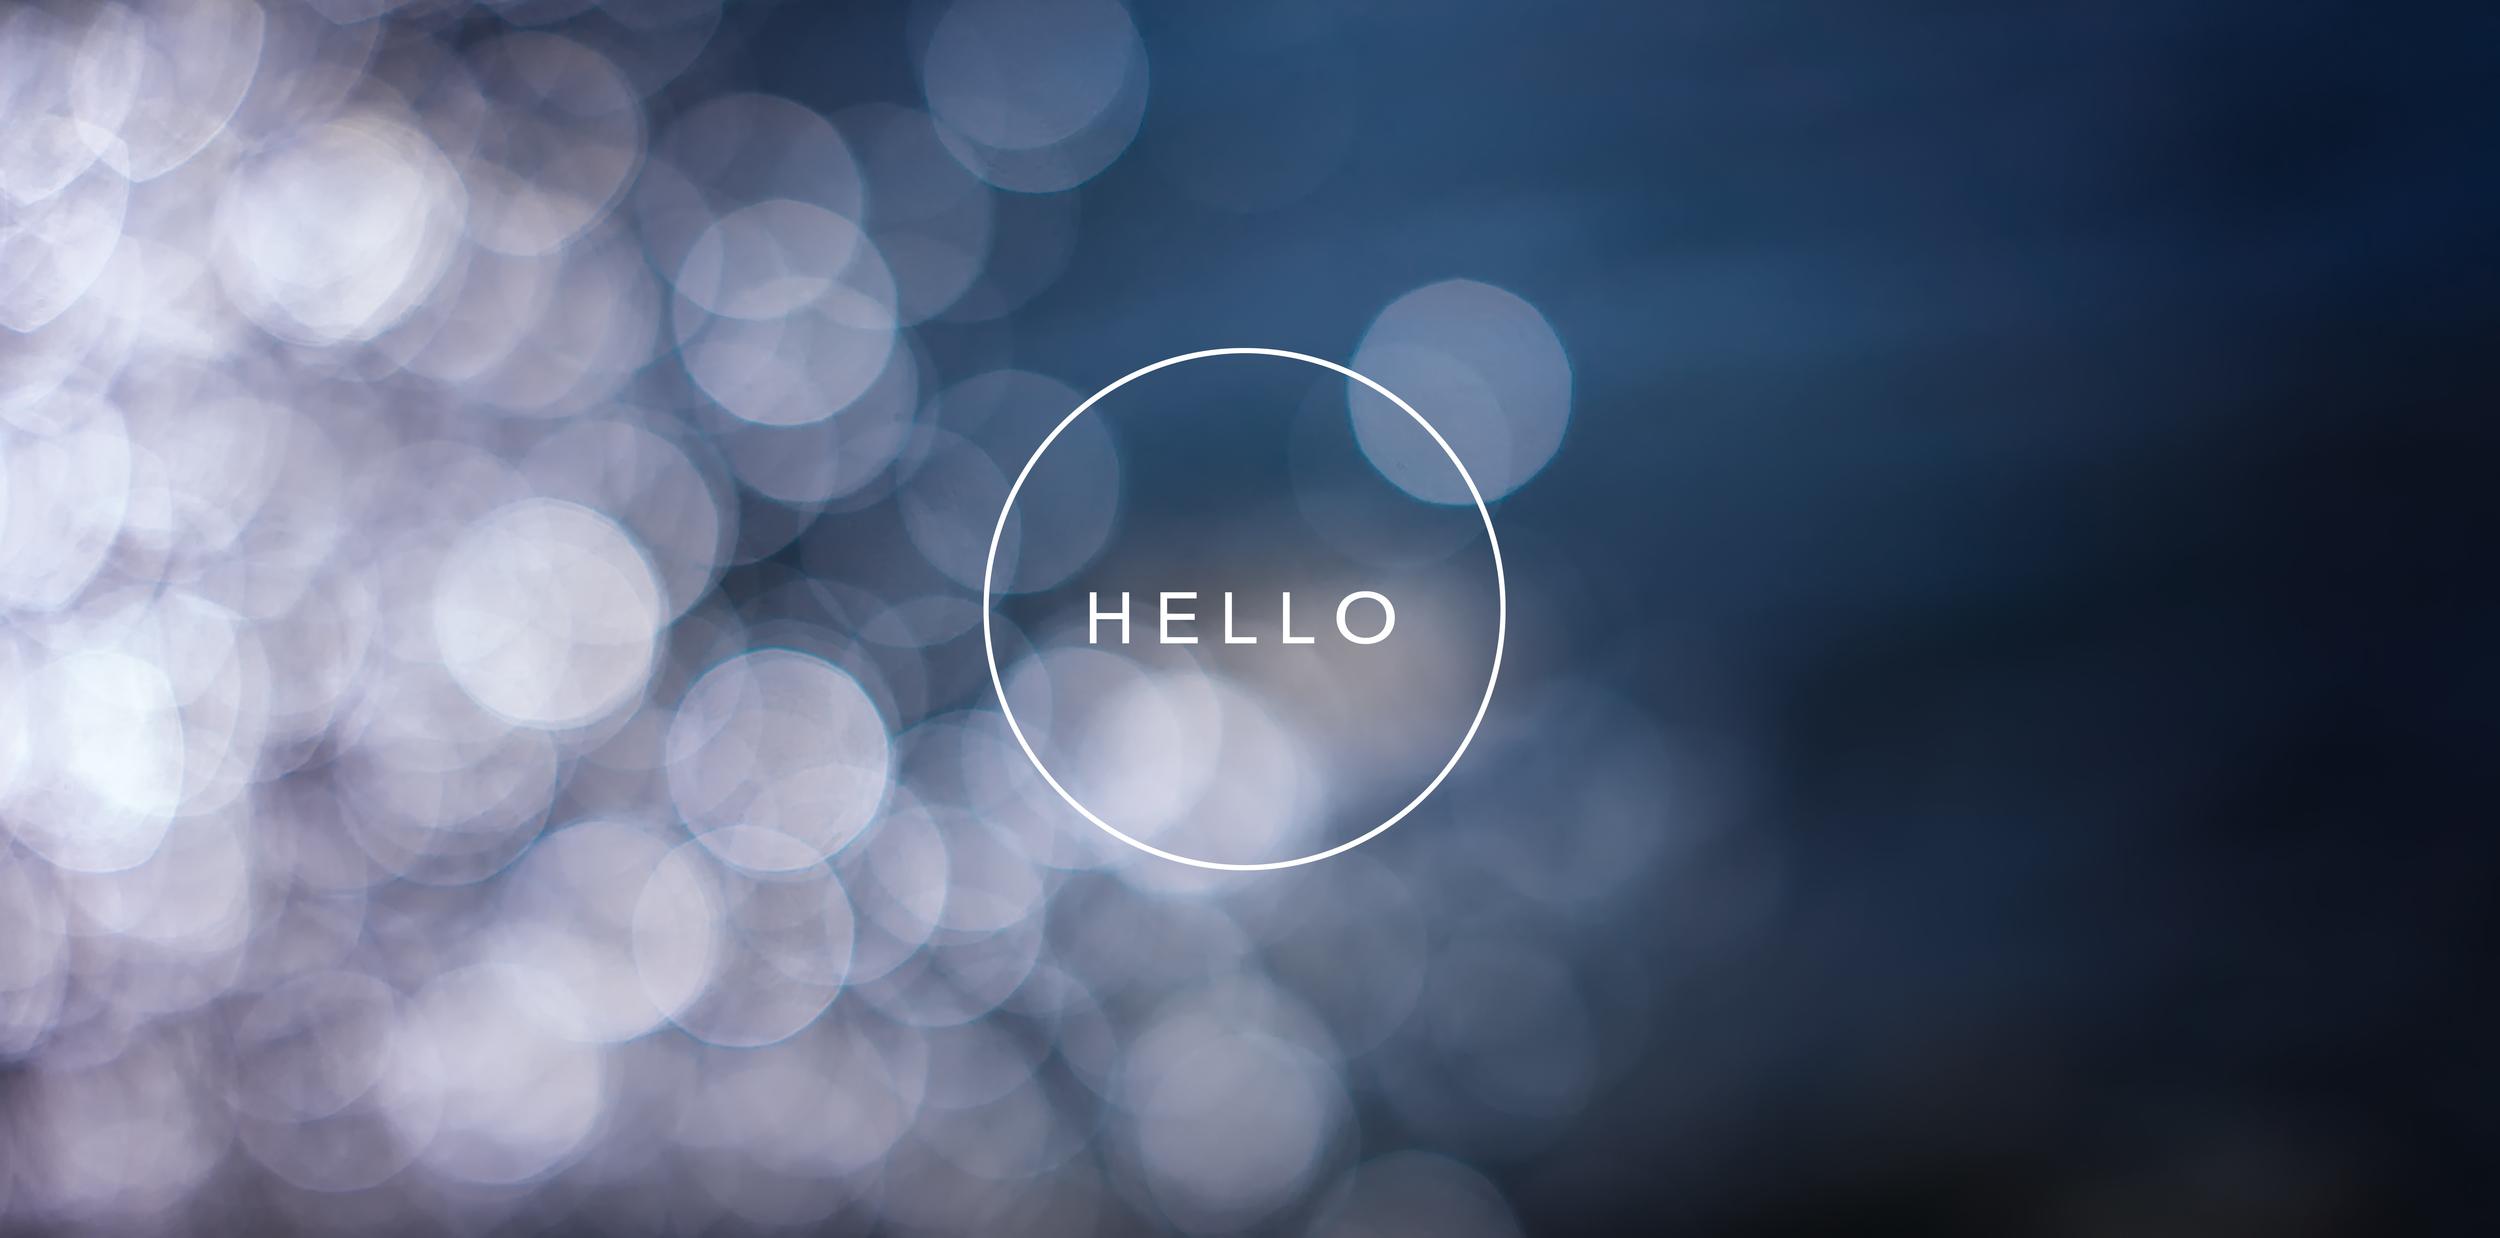 Elle Bruce -Sparkling Blue Beyond - HELLO - 20150416-06208.jpg